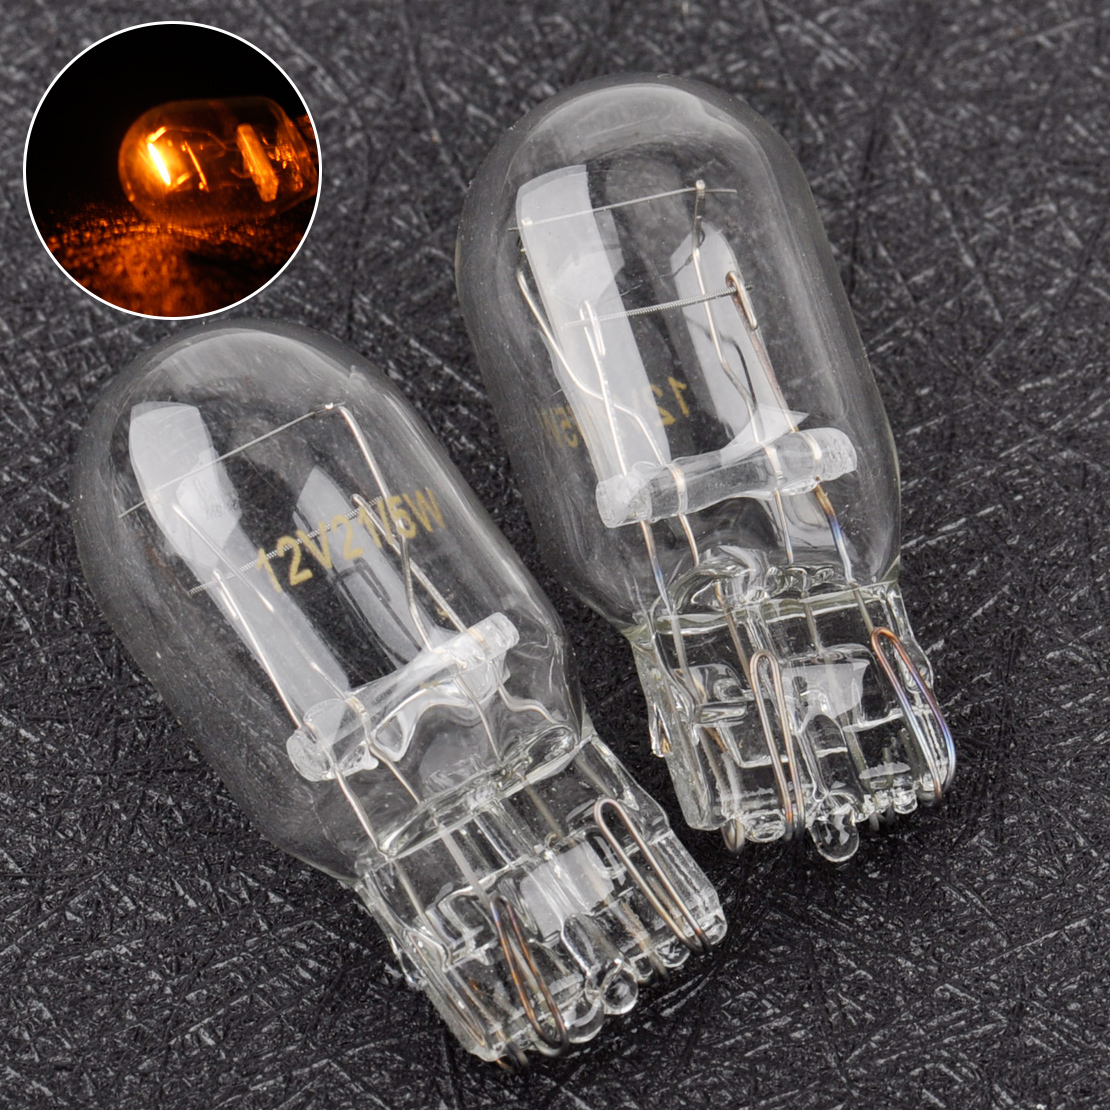 580 380W High Briglt Led Bulb Double Filament Wedge Bulb